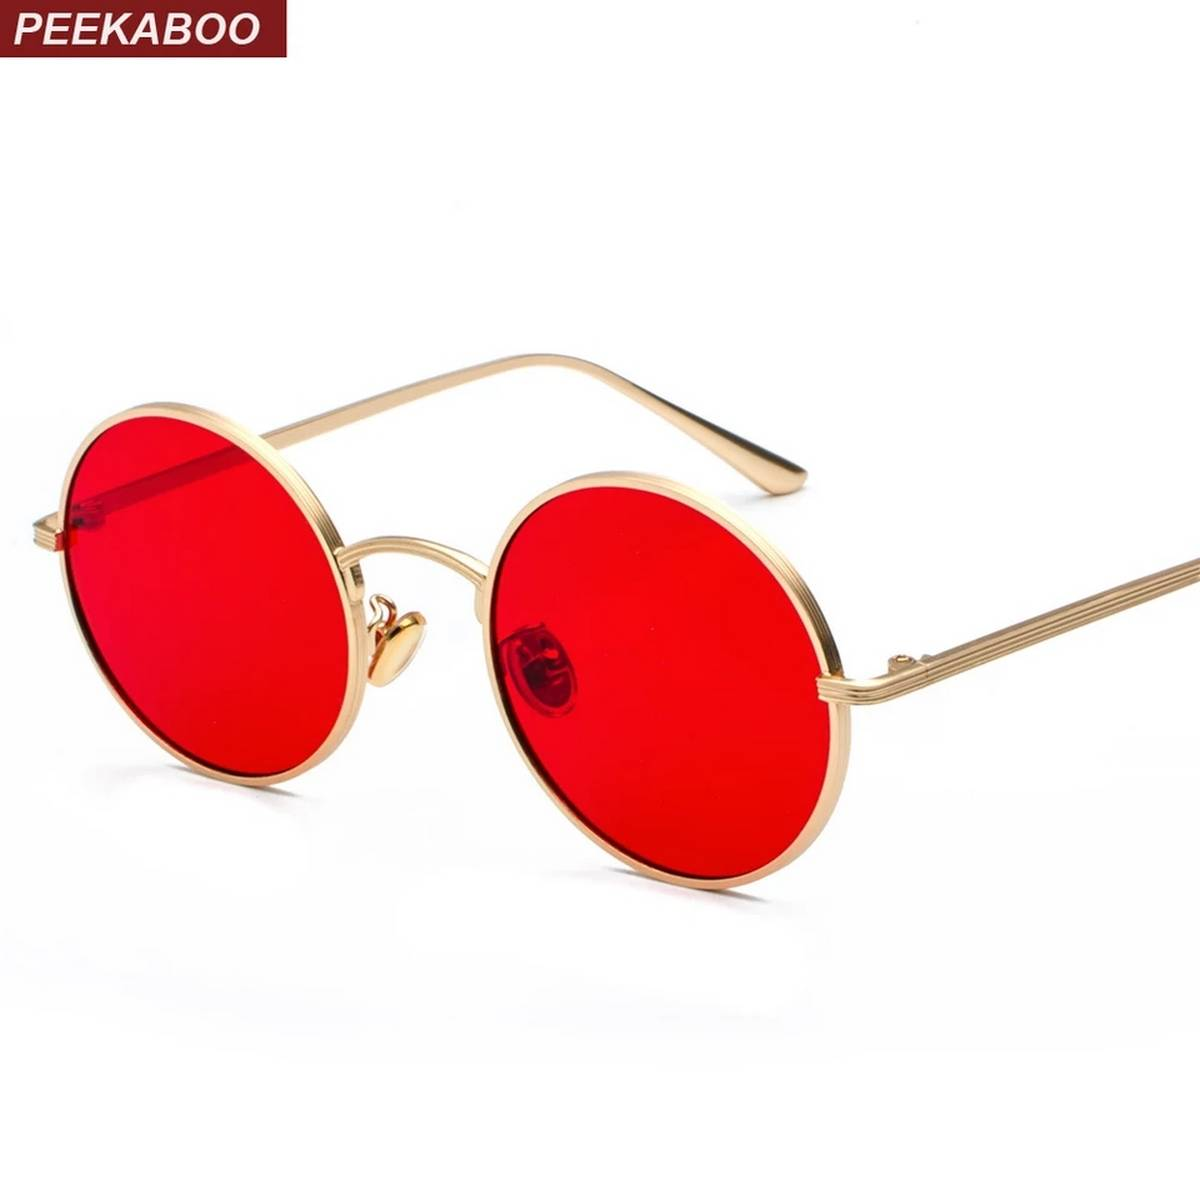 Sunglasses Yellow Round Glass Polarized Lens Vintage Eyewear Accessories Sun Glasses For Men